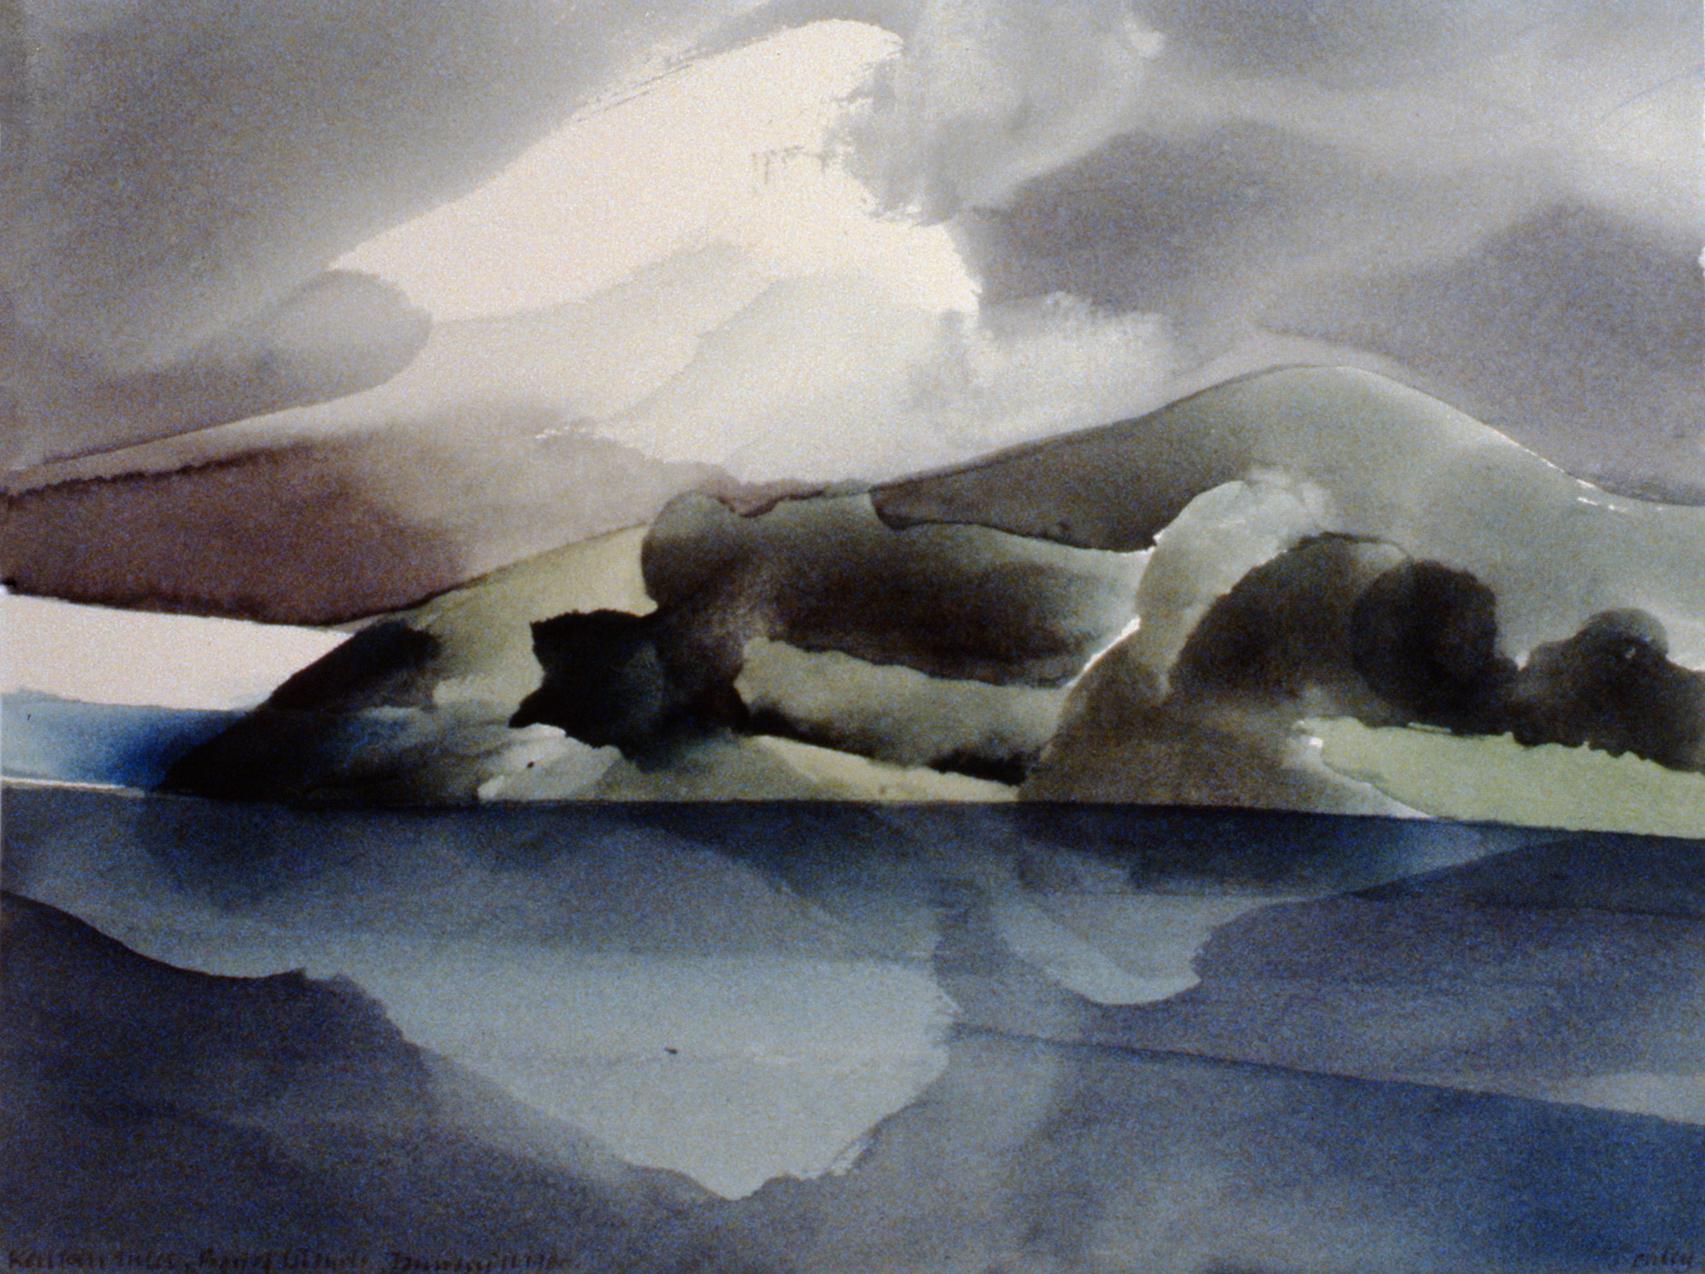 KeriKeri Inlet, New Zealand,  Toni Onley, watercolour on paper, 29.4 x 38.5 cm, 1983.04.01. Gift of Dr. Illington Kerr.